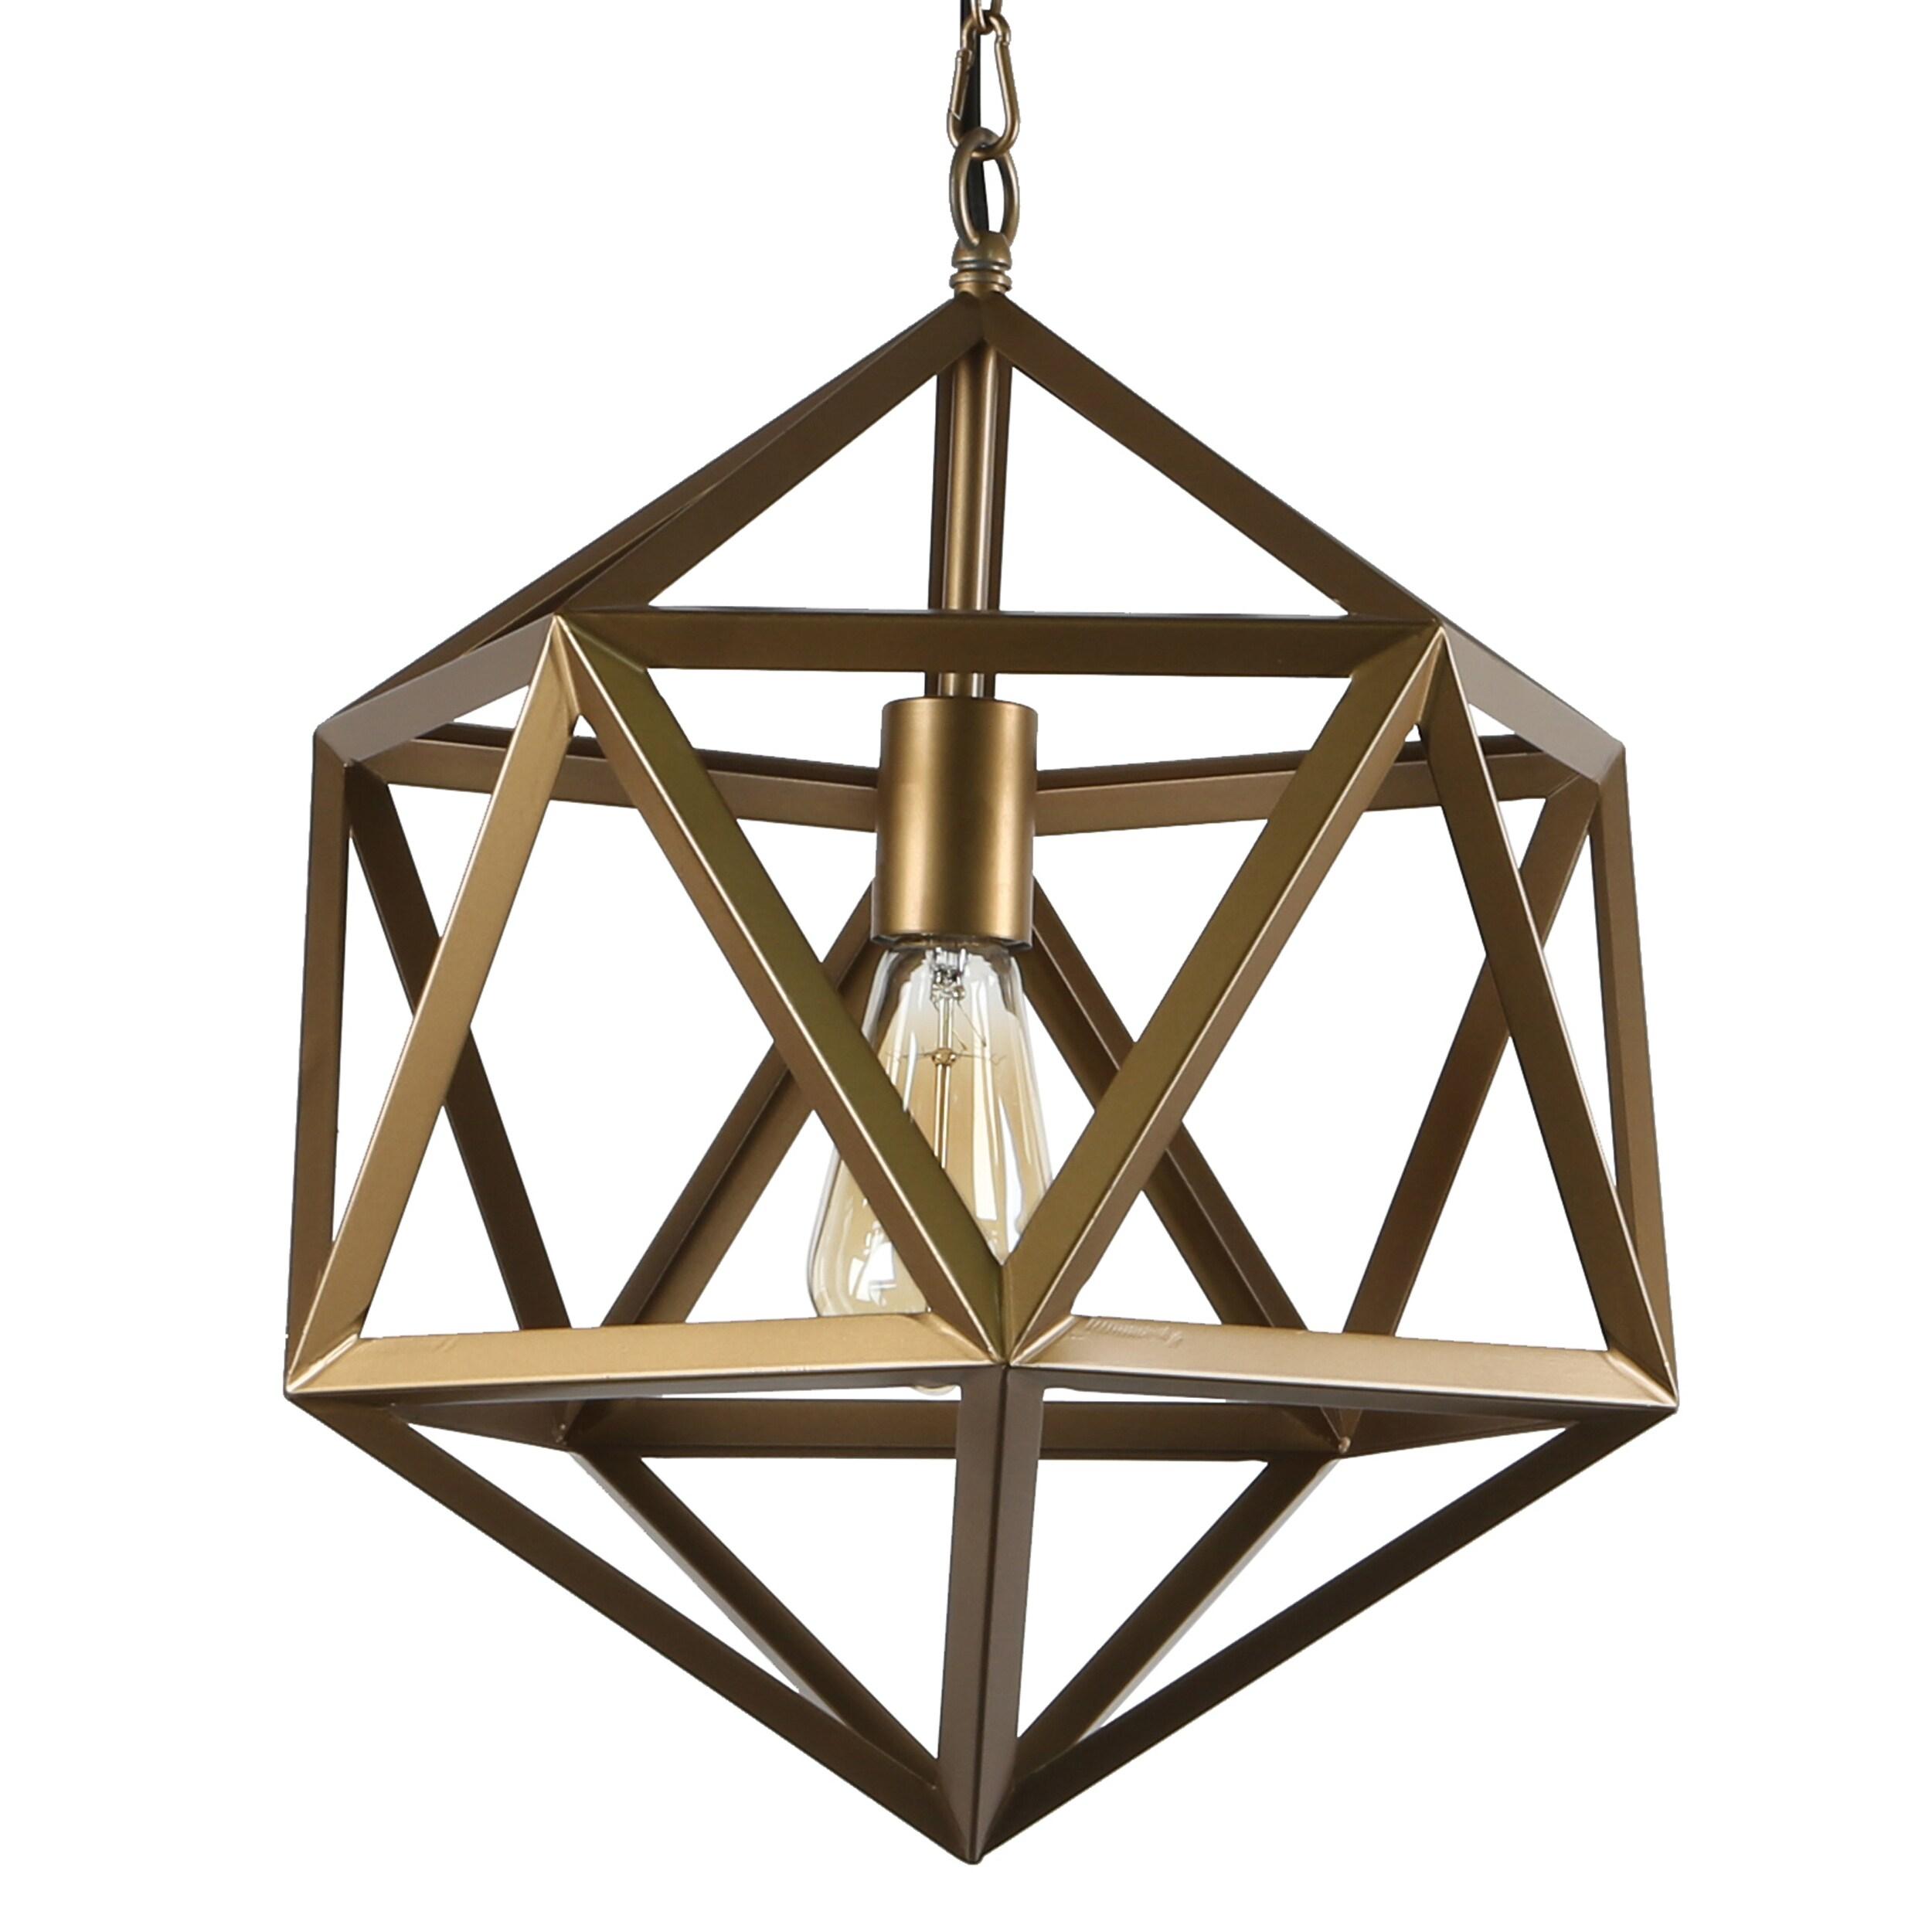 journee lighting. Journee Collection \u0027Lancaster\u0027 Iron 16-inch Hardwired Edison Bulb Pendant Lamp - Free Shipping Today Overstock 23426339 Lighting N